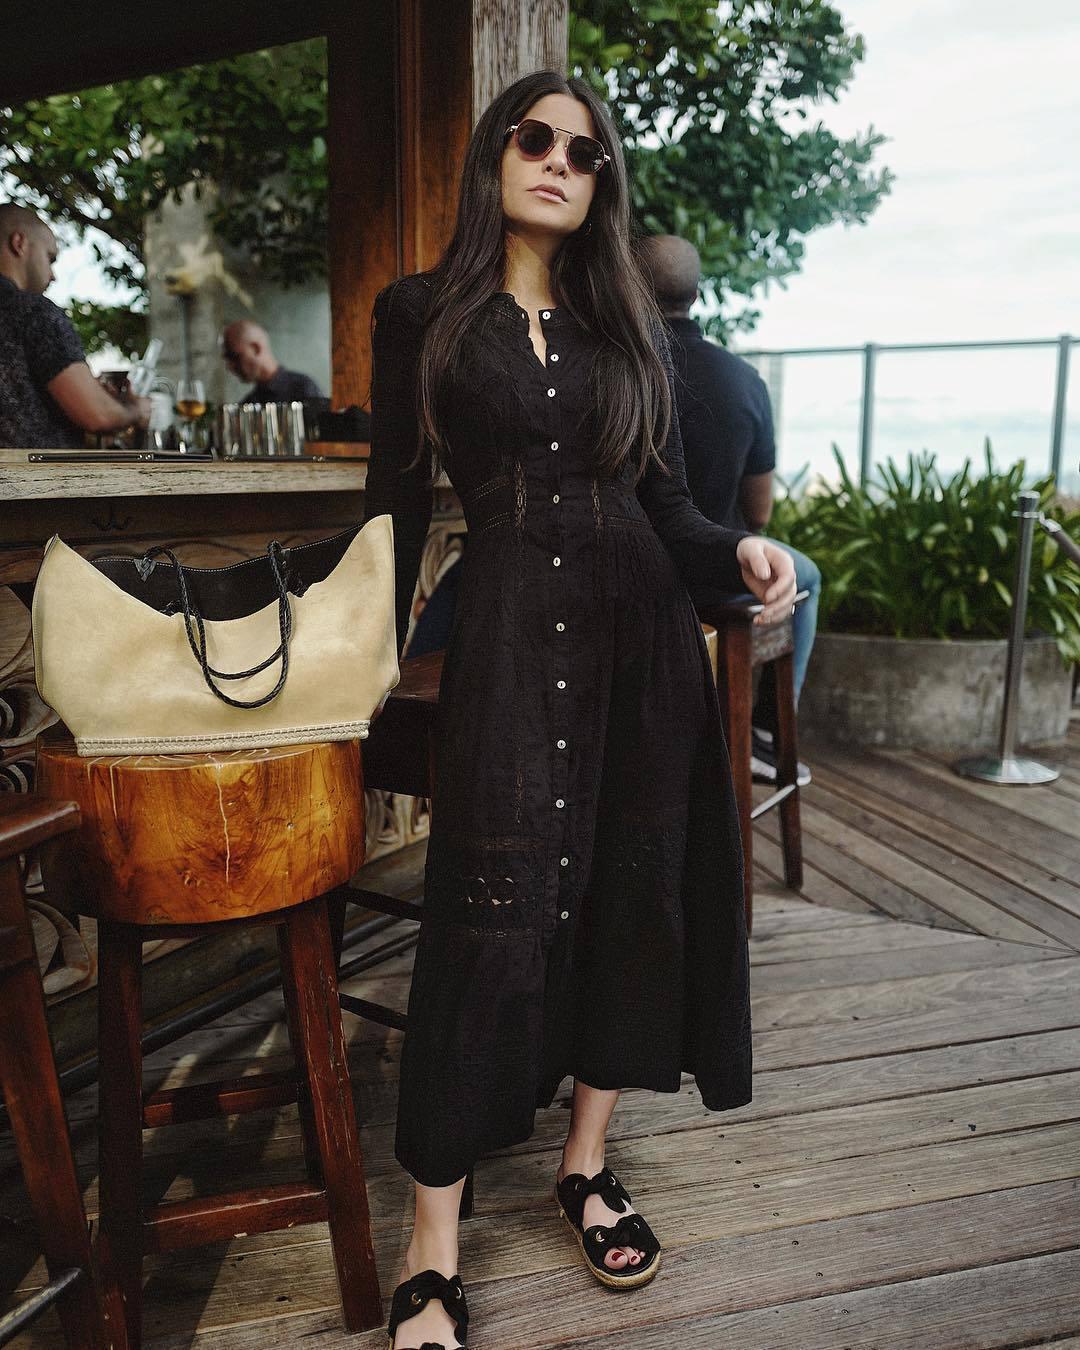 dress shirt dress black dress maxi dress lace dress black flats bag sunglasses